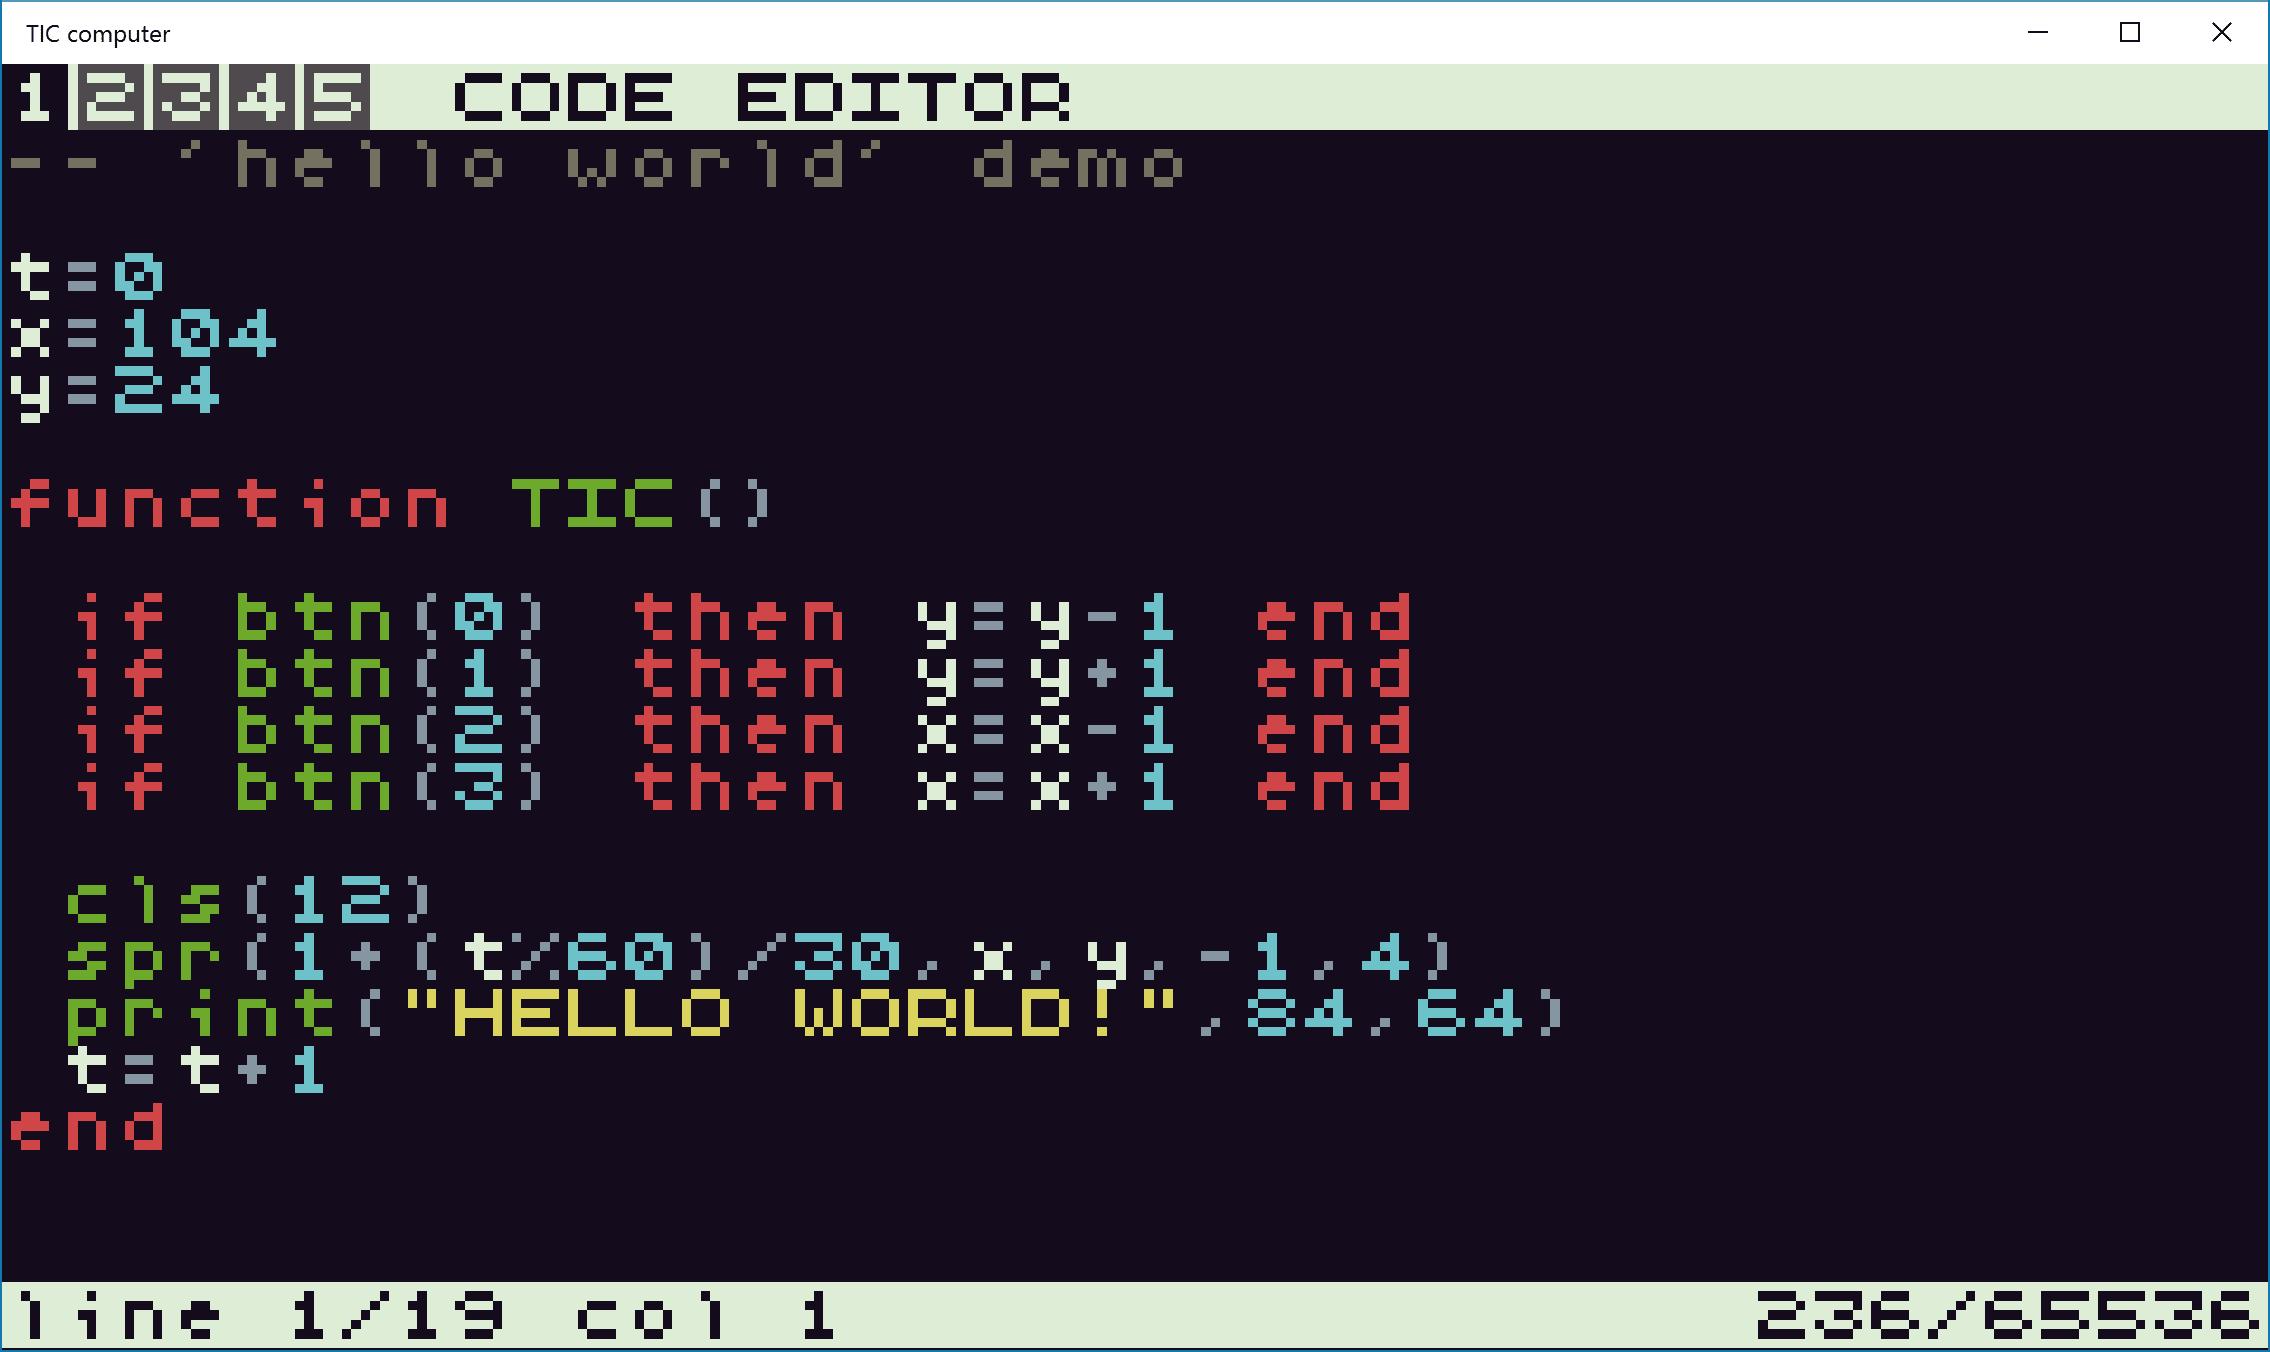 TIC computer